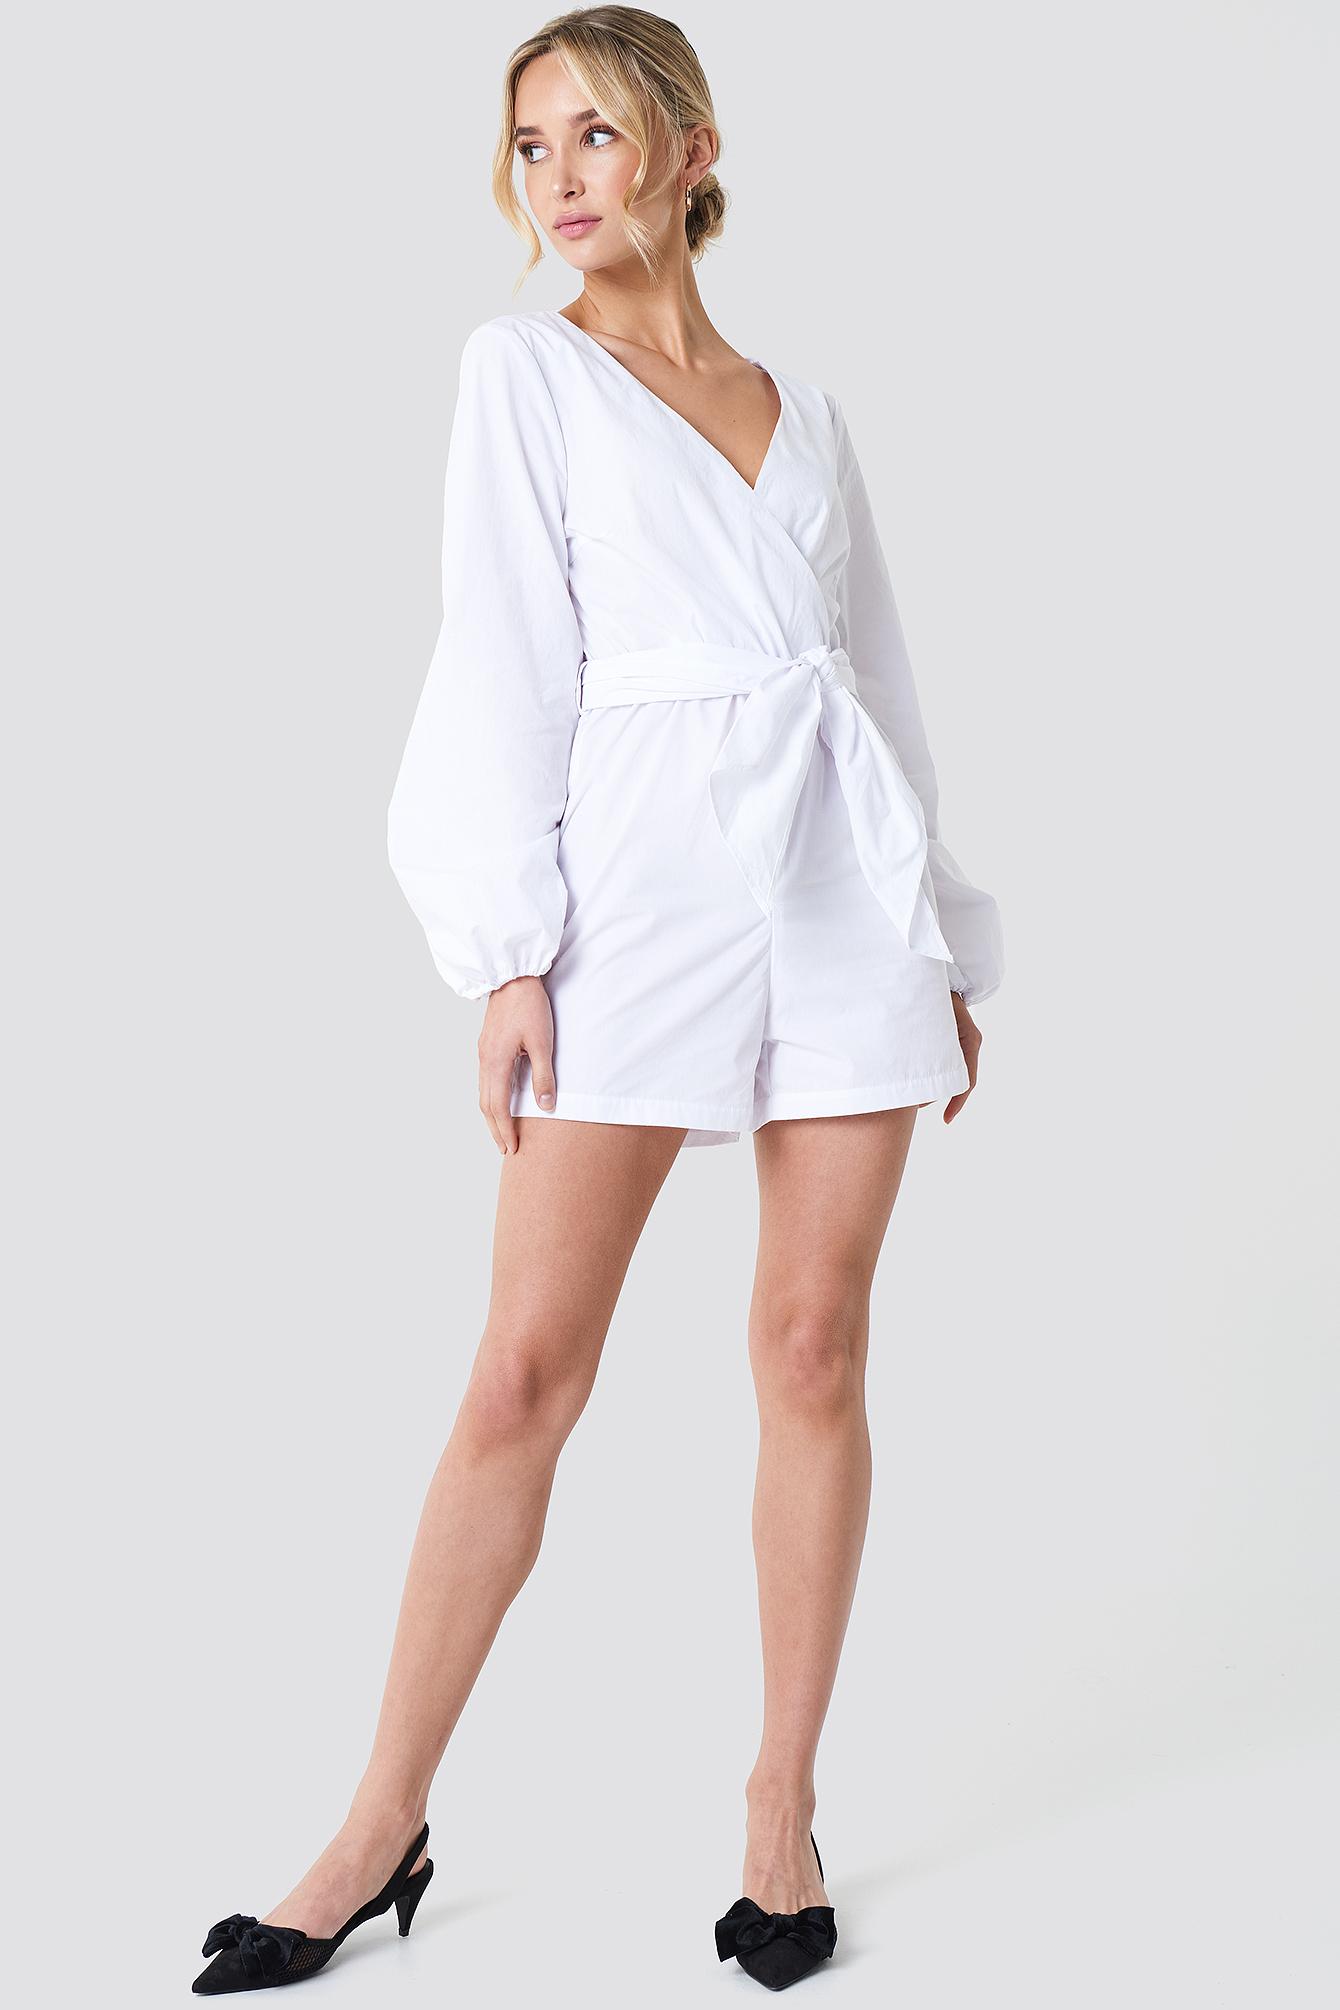 na-kd boho -  Balloon Sleeve Shirt Playsuit - White